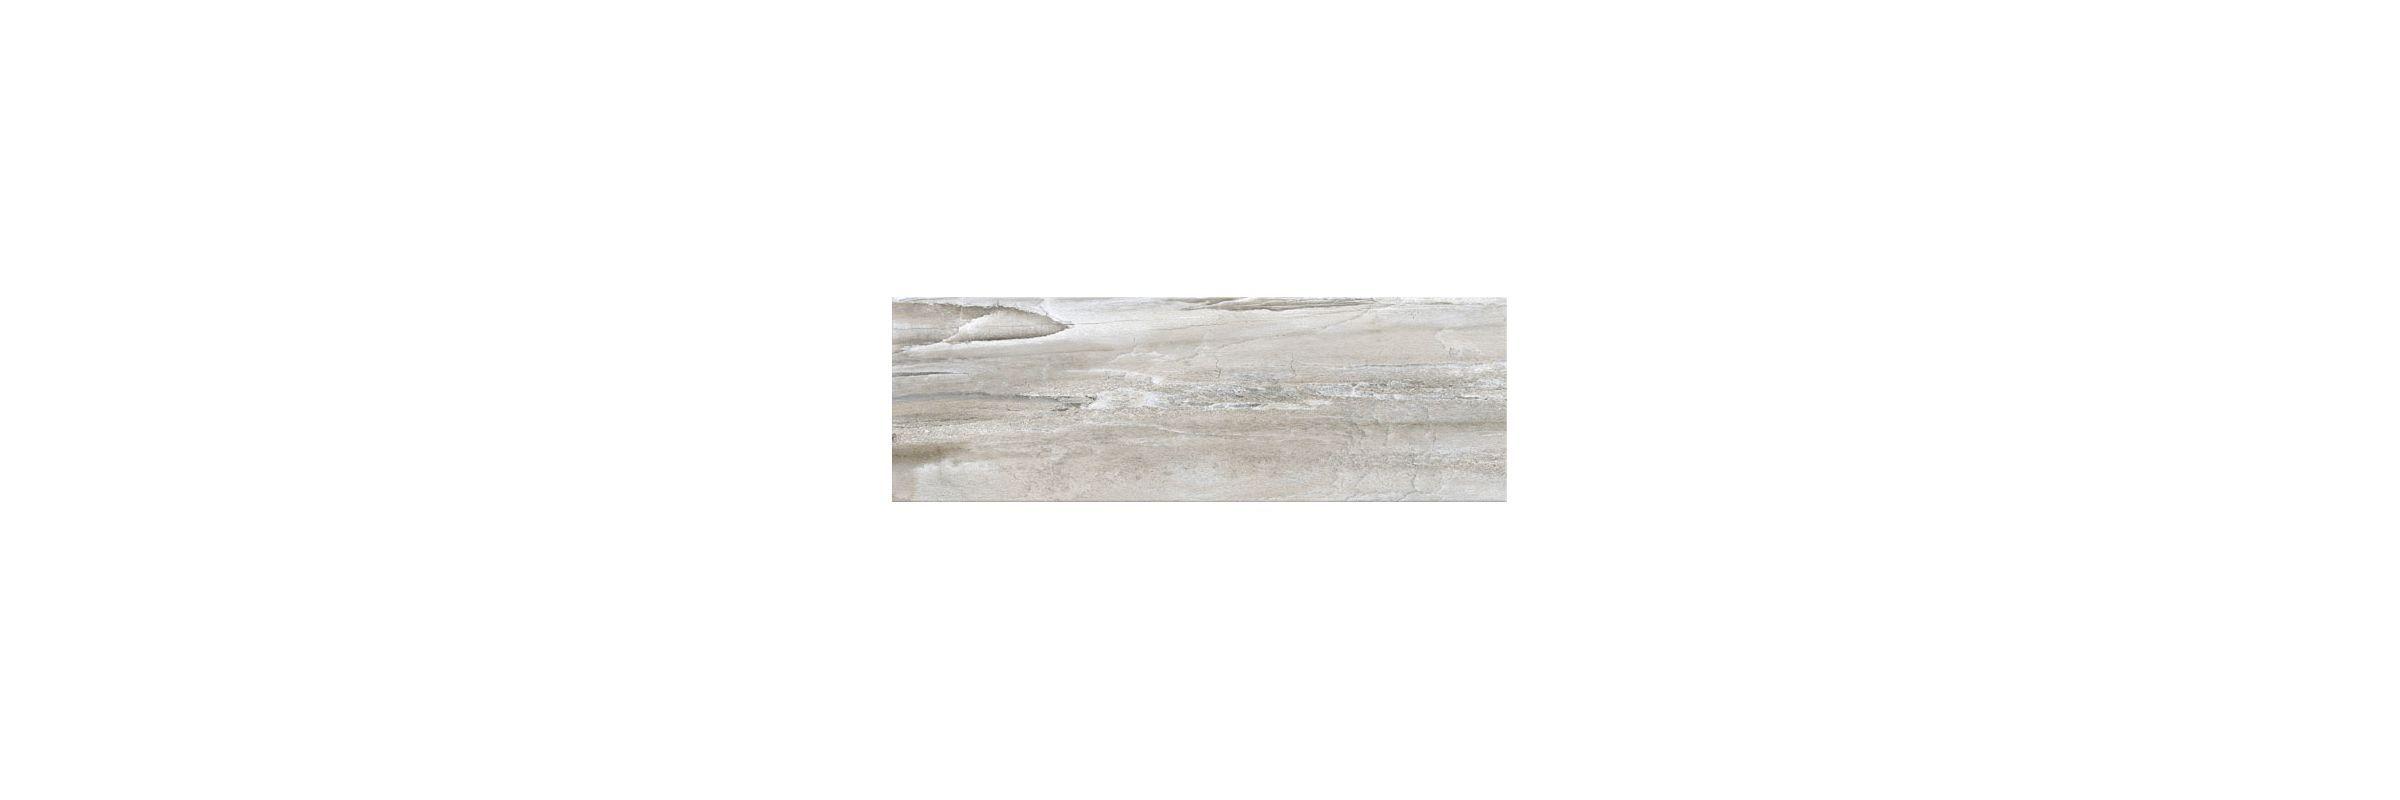 "Miseno MT-G4463 Toro Tile - 8"" X 24"" - Wood Visual - Floor Tile (10.67 SF/Carton Driftwood Tile Floor Tile"